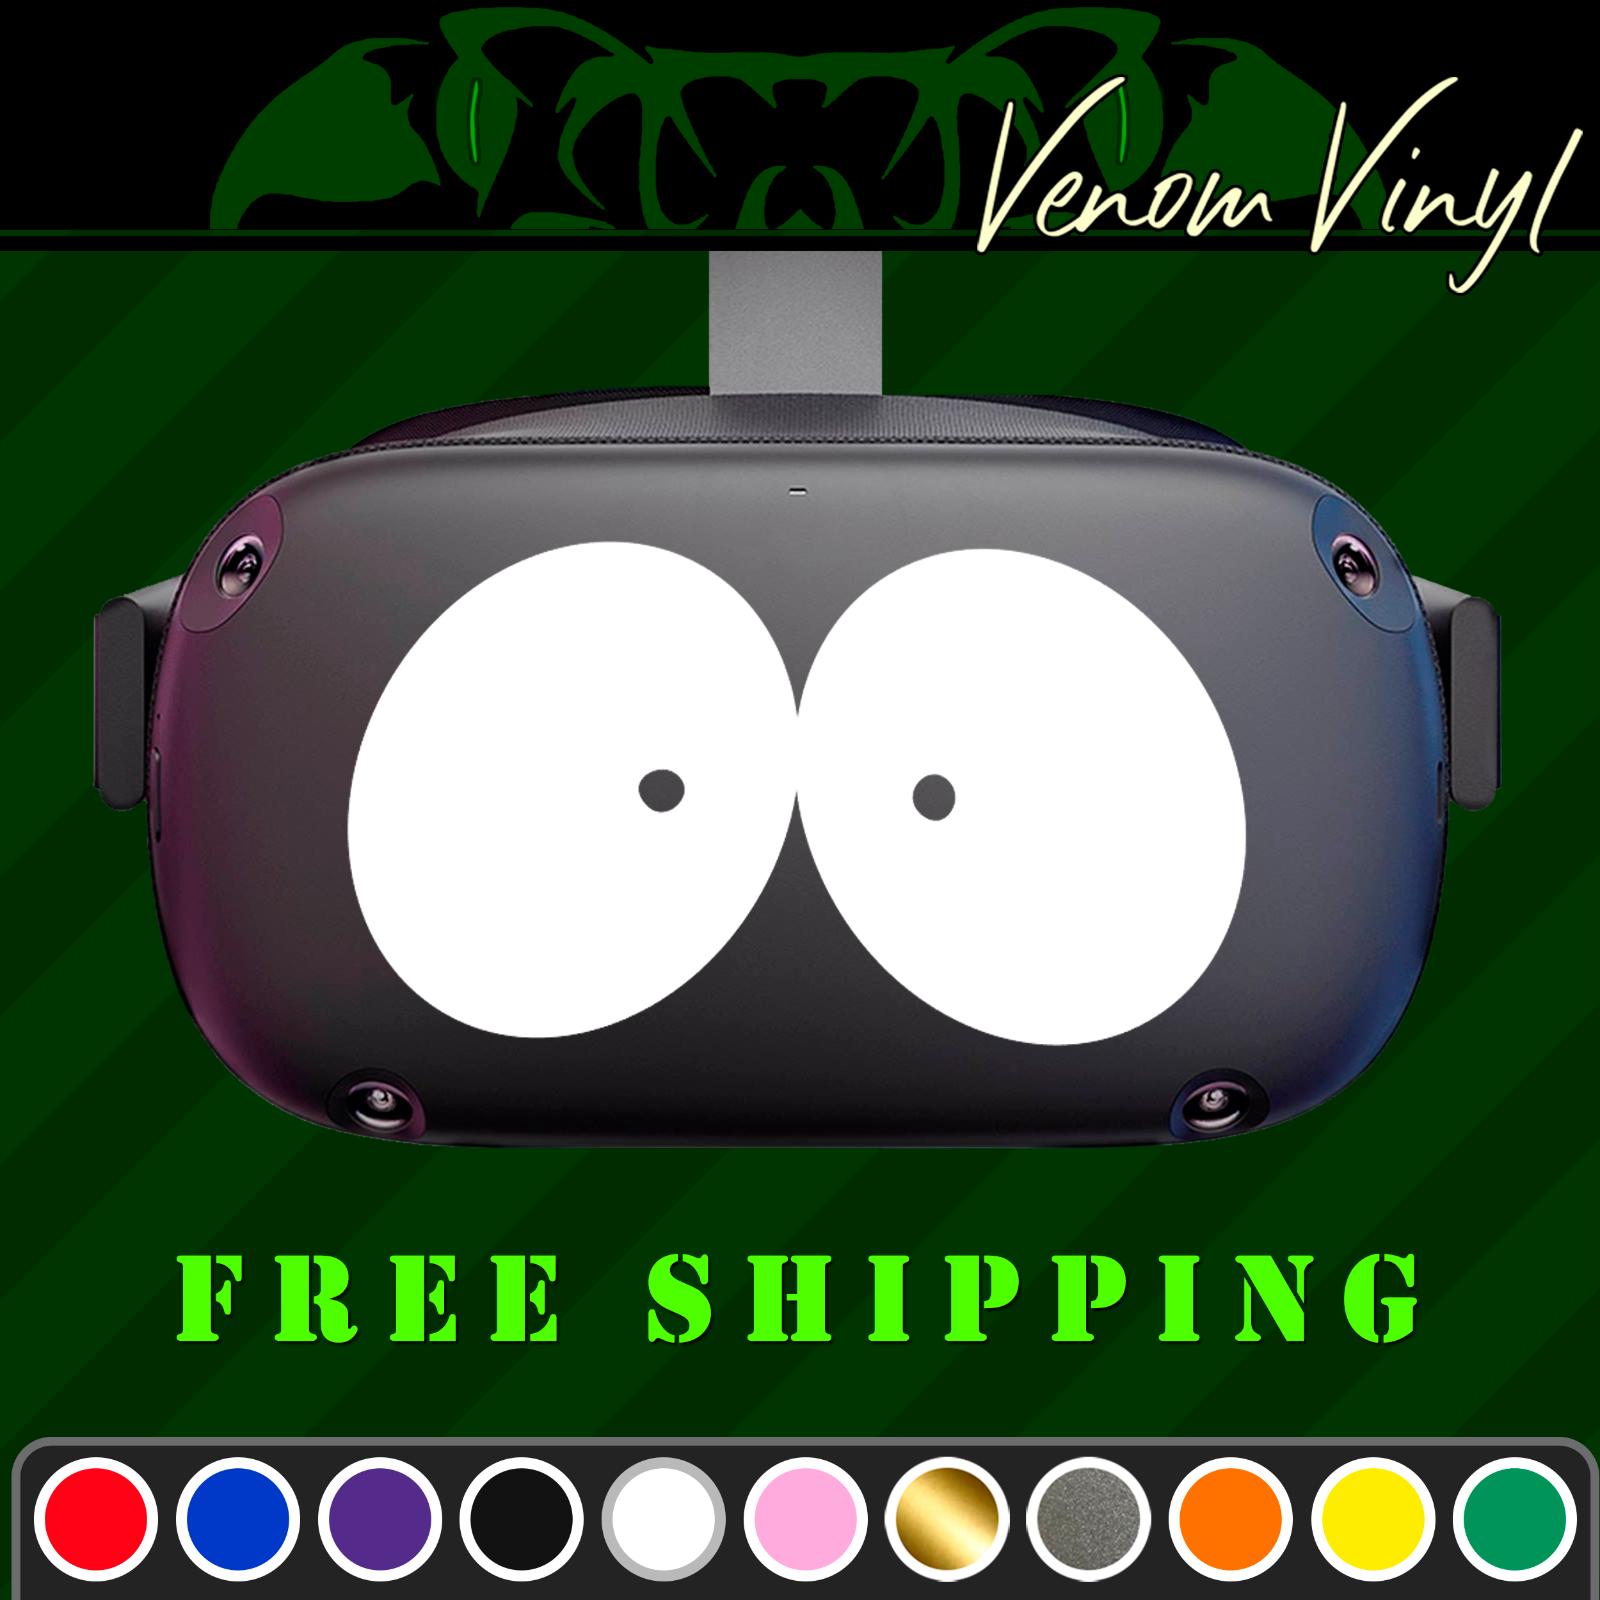 Cartoon Eyes Vinyl Decal Fits Oculus Quest Rift Psvr Vr Headsets Ebay In 2020 Funny Vinyl Decals Custom Vinyl Decal Vinyl Decals